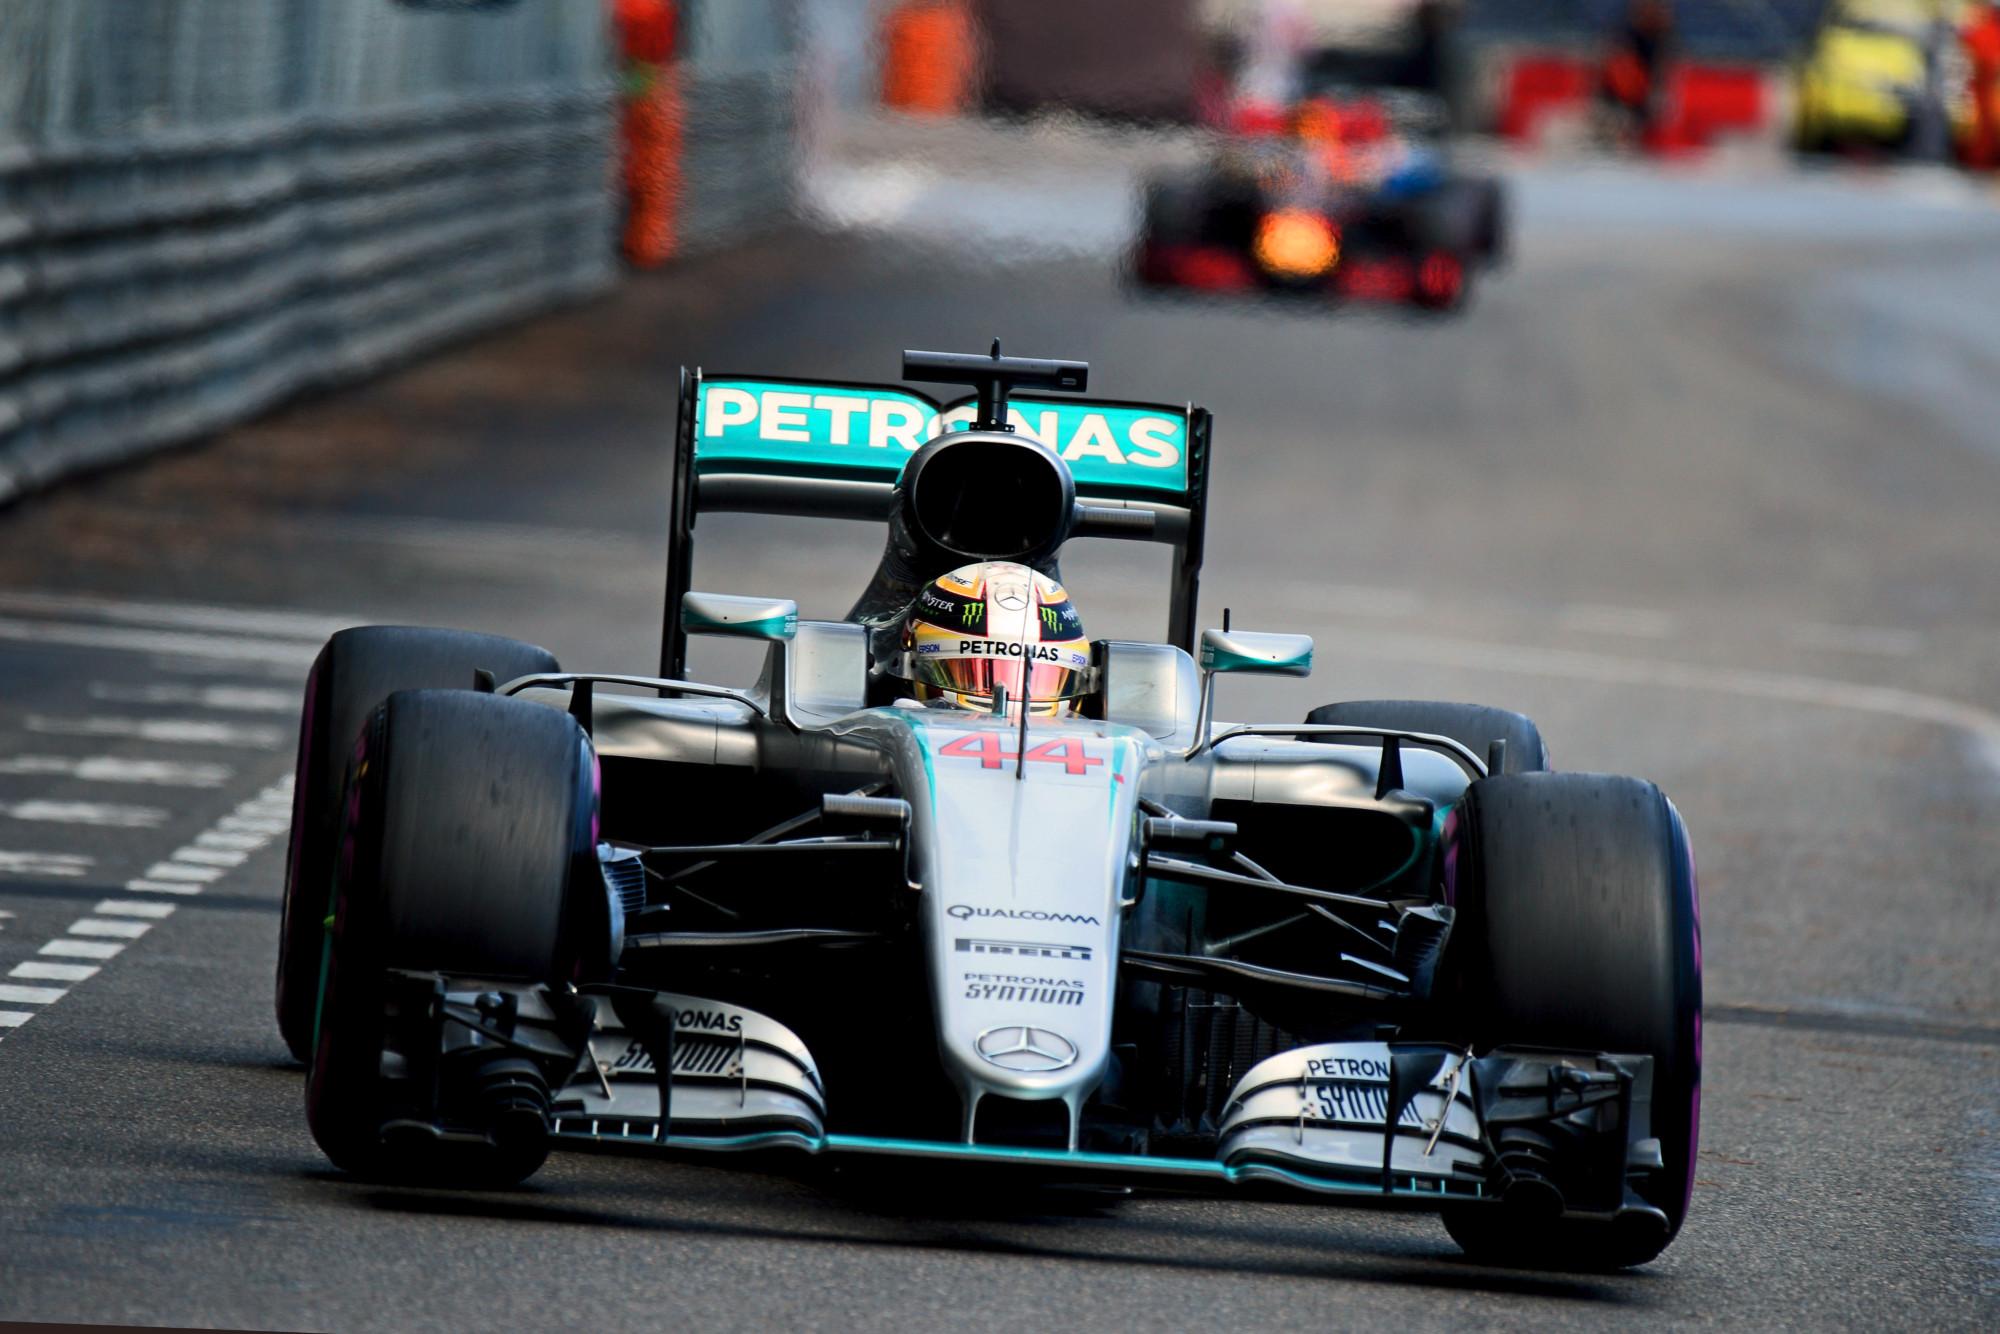 Lewis Hamilton leading the Monaco Grand Prix